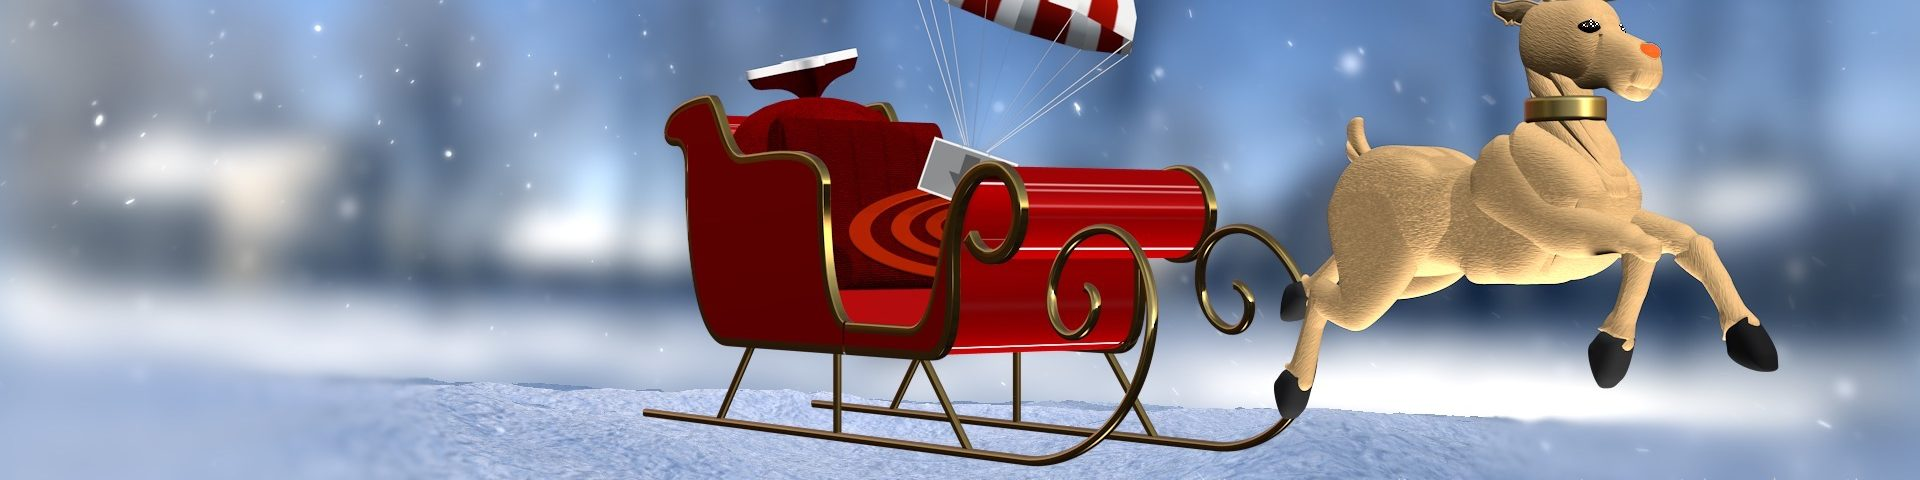 Santa's Sleigh and Rudolph